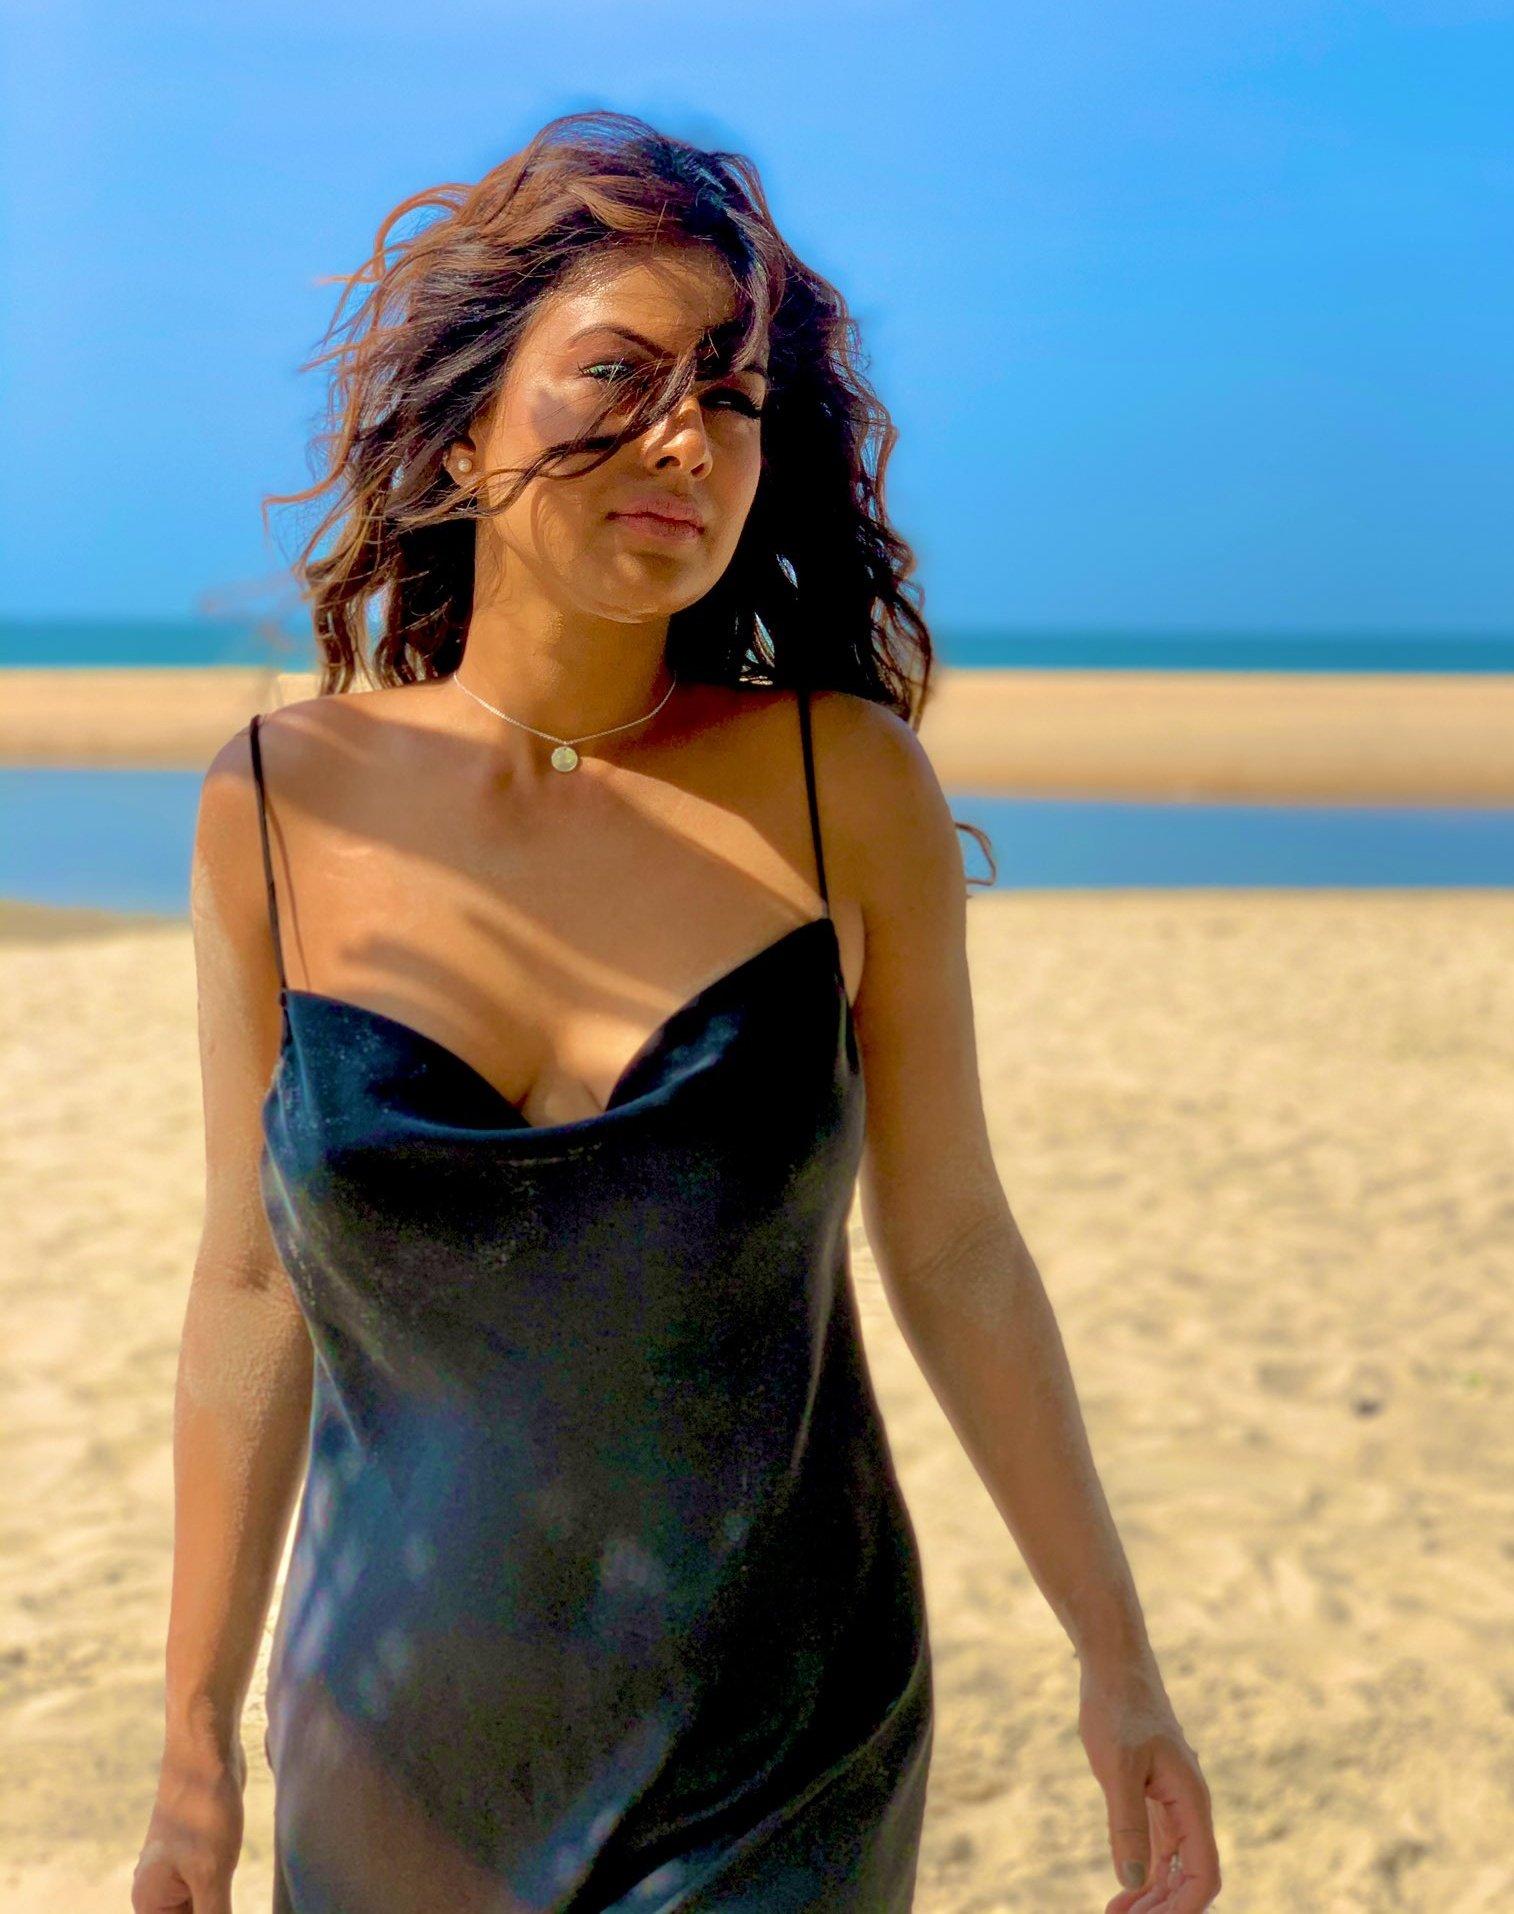 Hot Woman In Beach Photo Xhamster HD